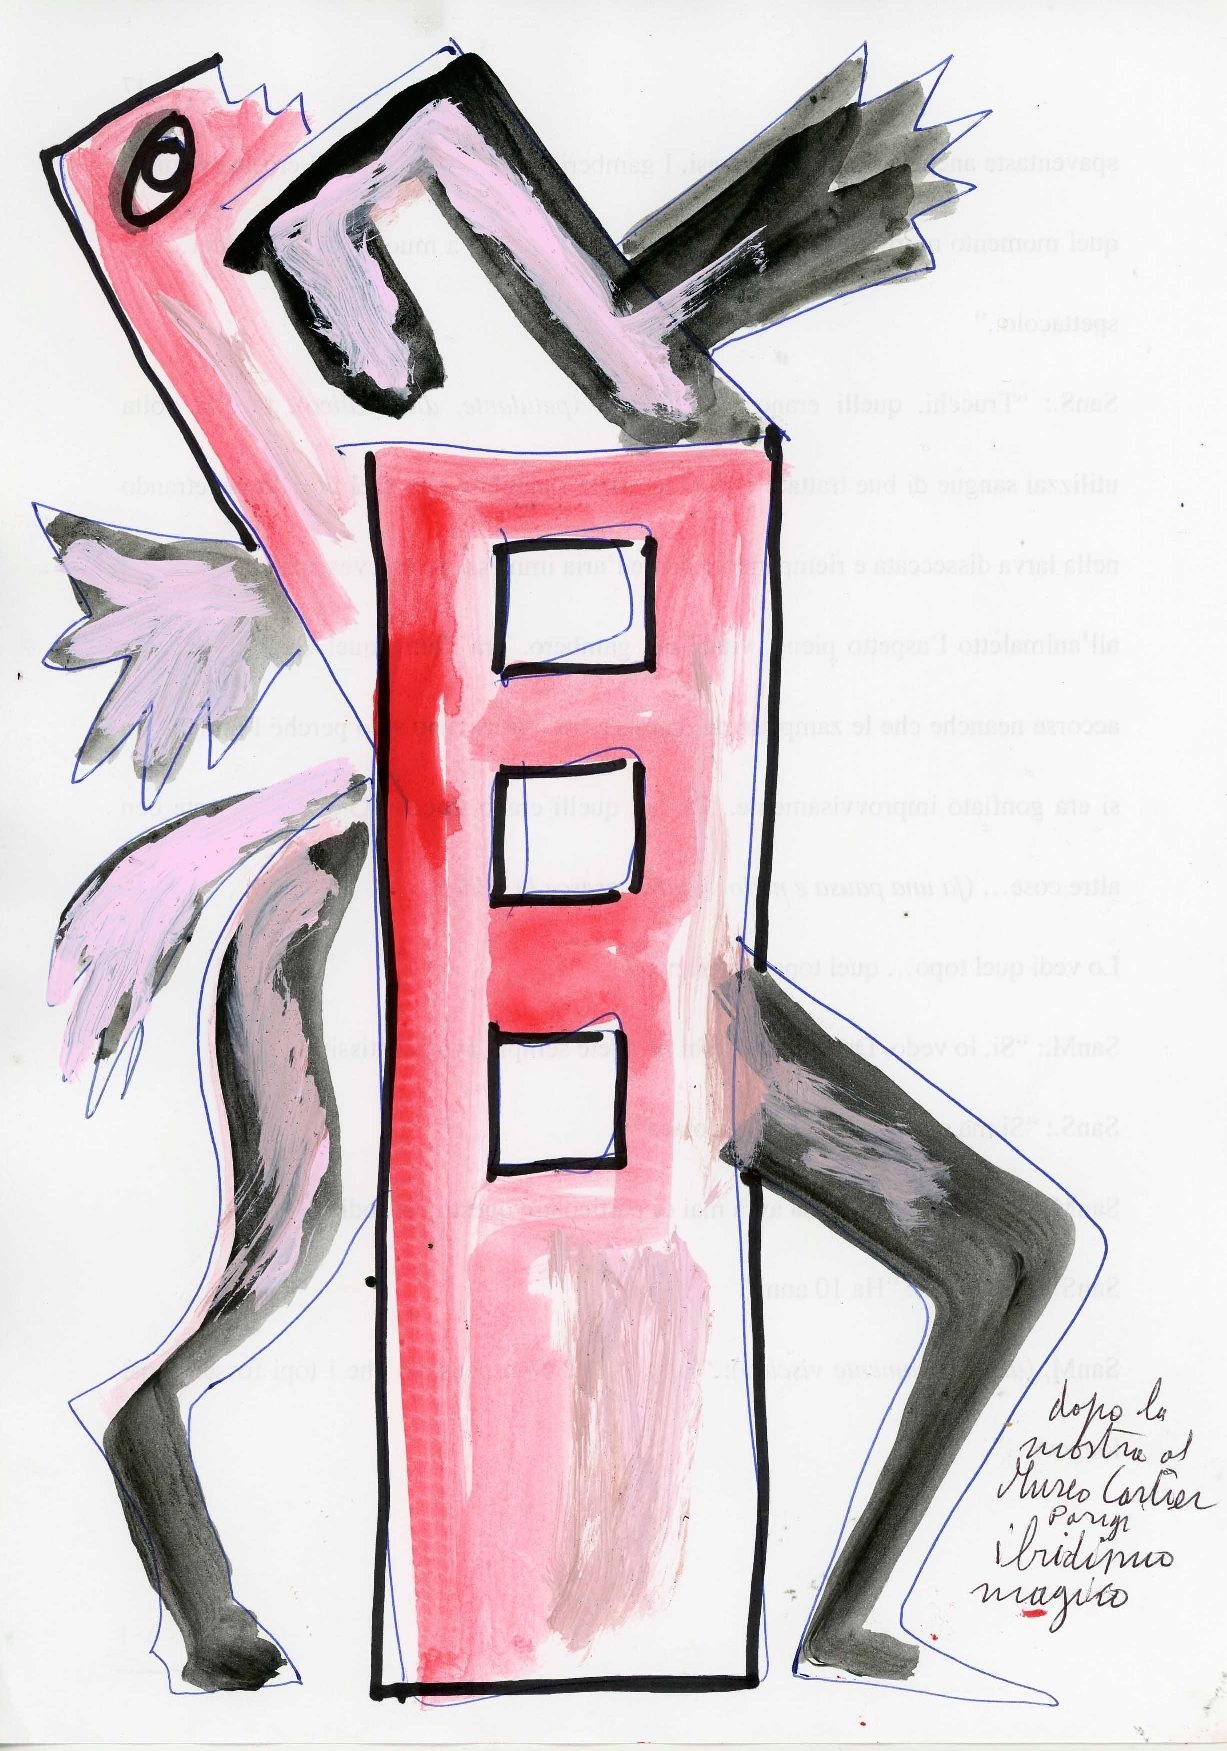 Ibridismo magico, tecnica mista su carta, 2001, cm 29,5x21